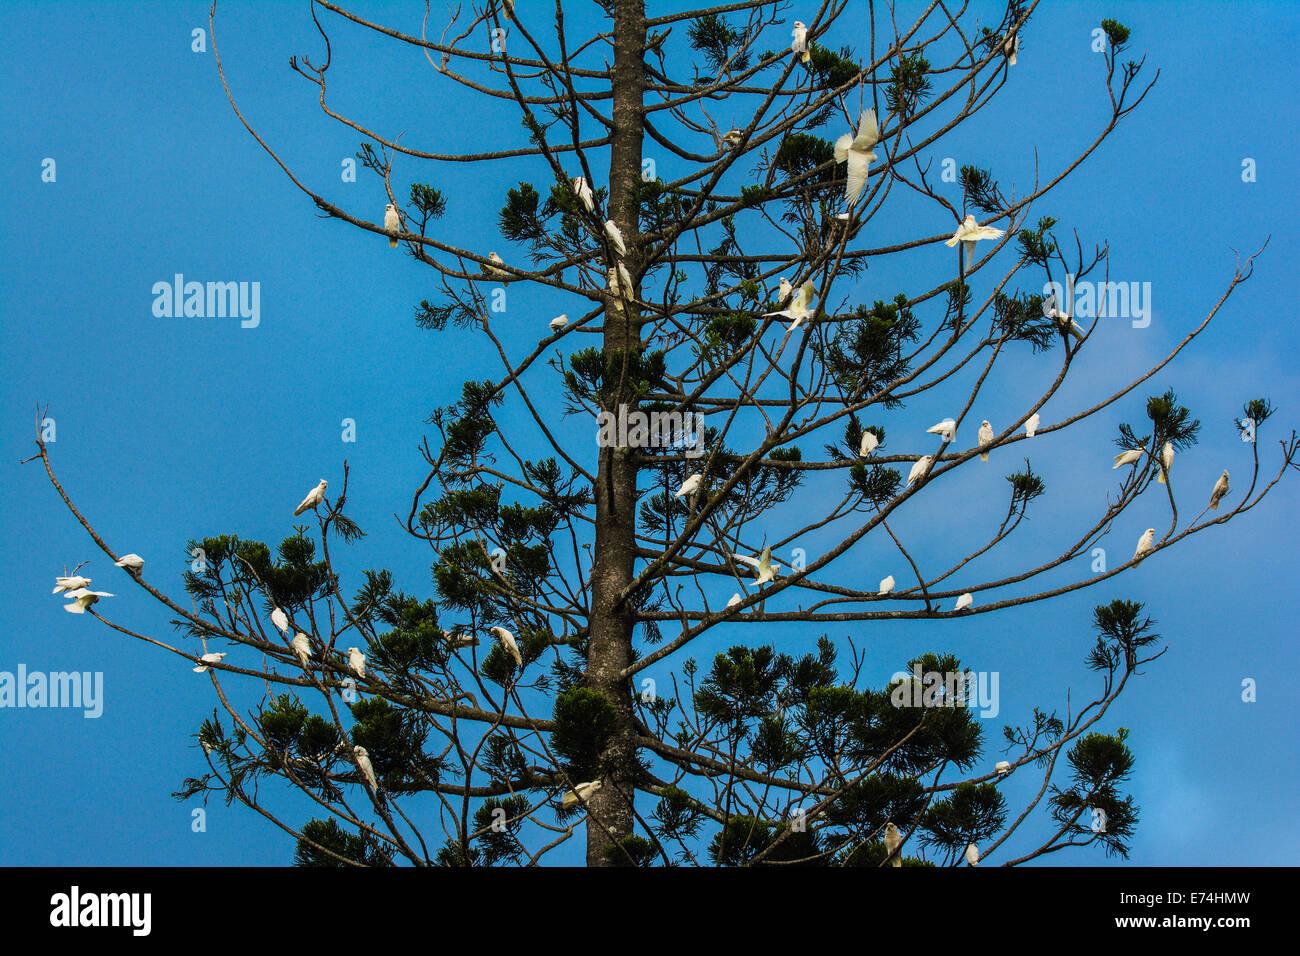 Corella flock in a Bunya Nut tree, Brisbane, Queensland, Australia - Stock Image